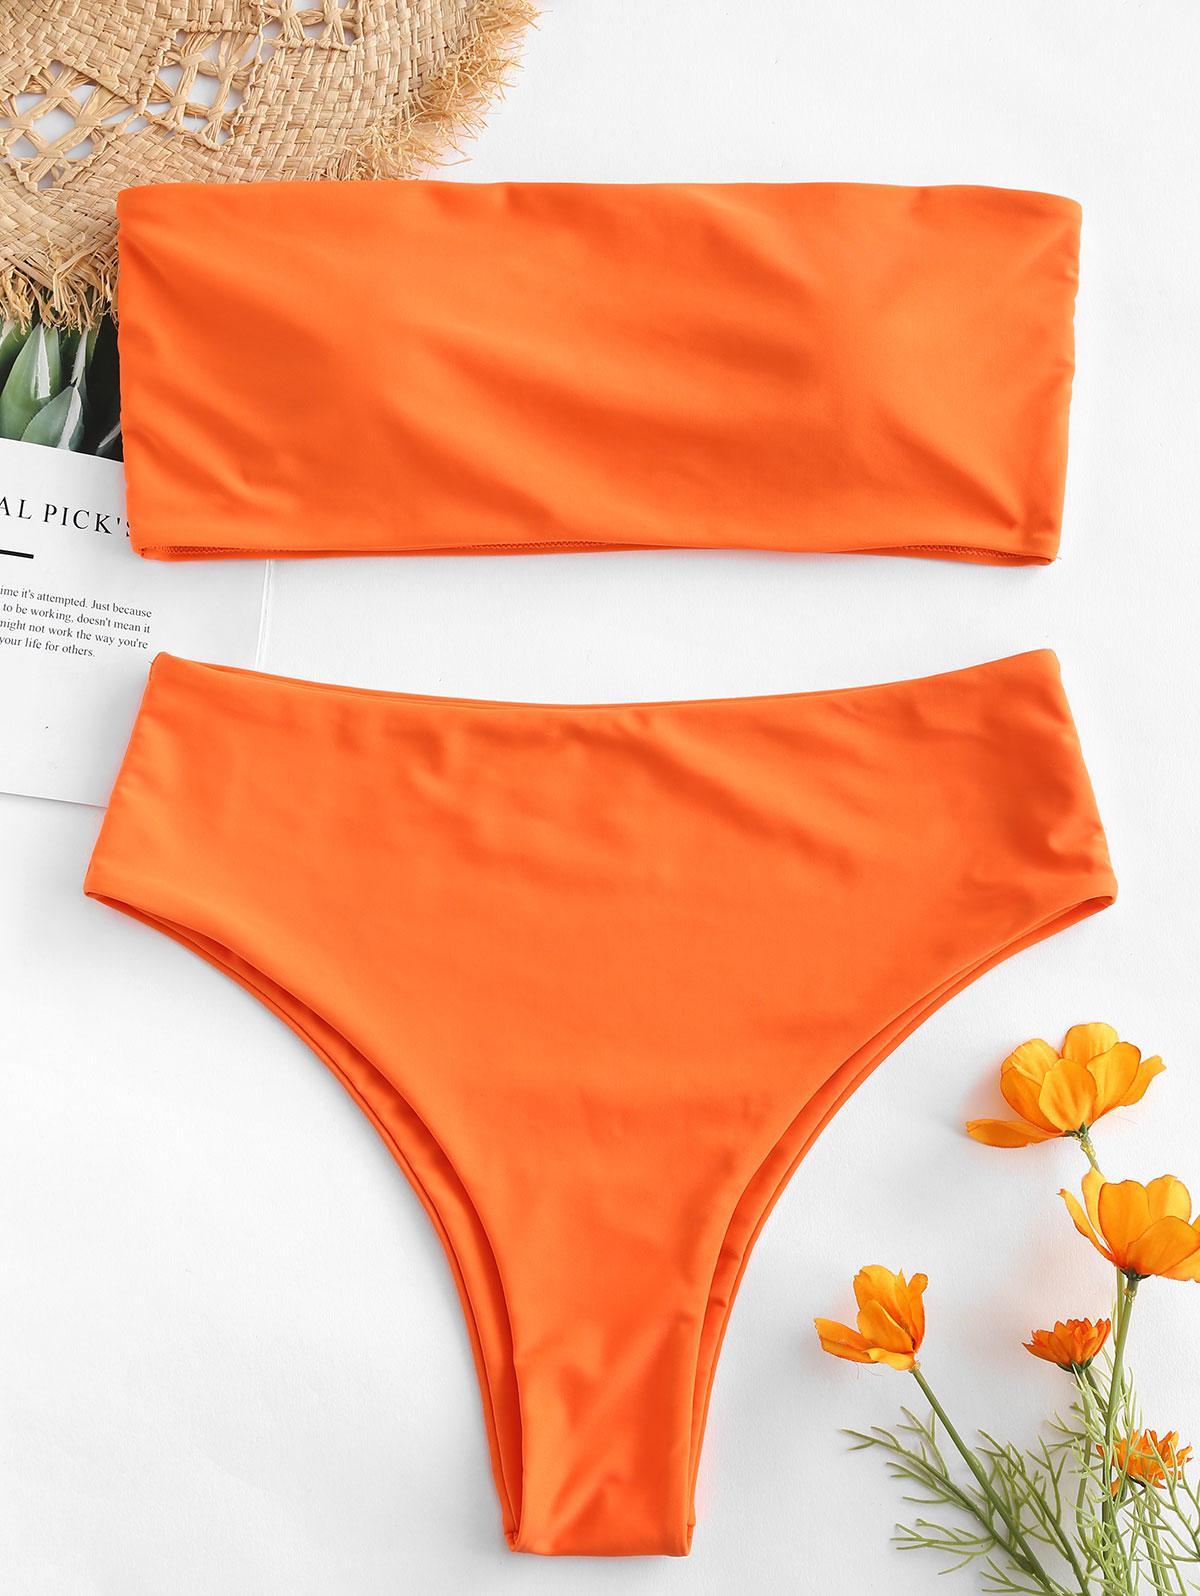 ZAFUL High Waisted Bandeau Bikini Set, Bright orange